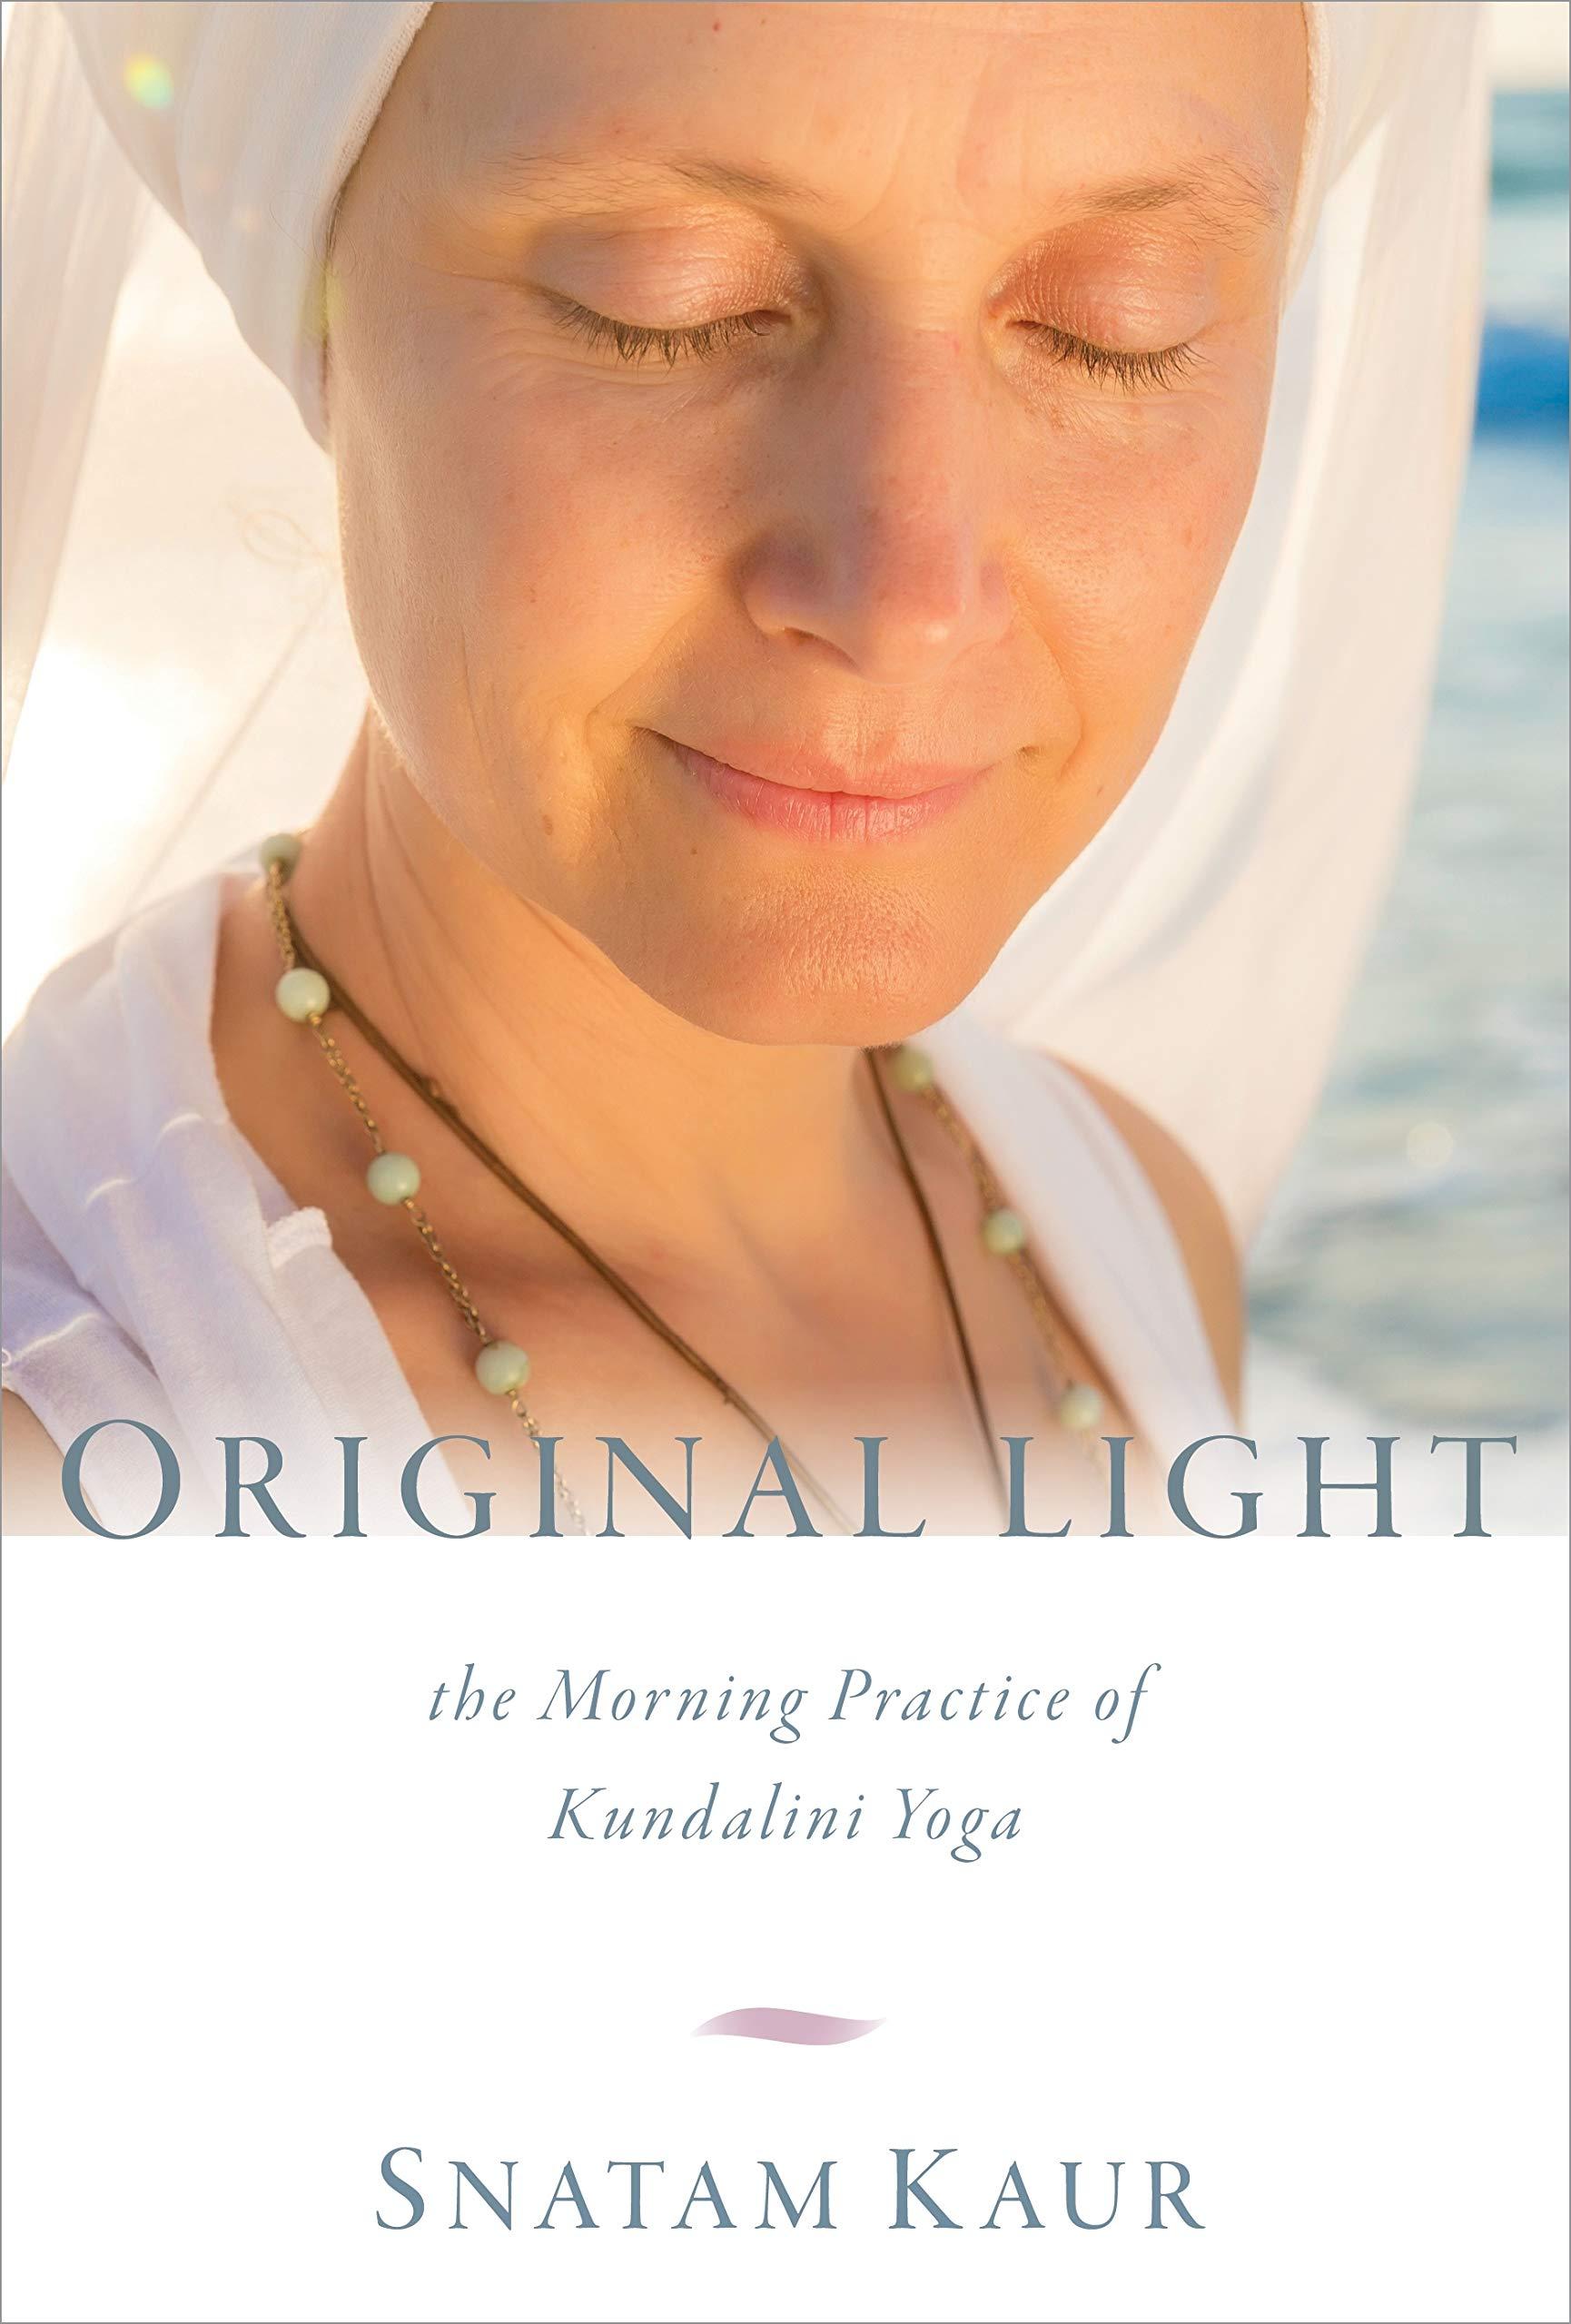 Amazon.com: Original Light: The Morning Practice of ...